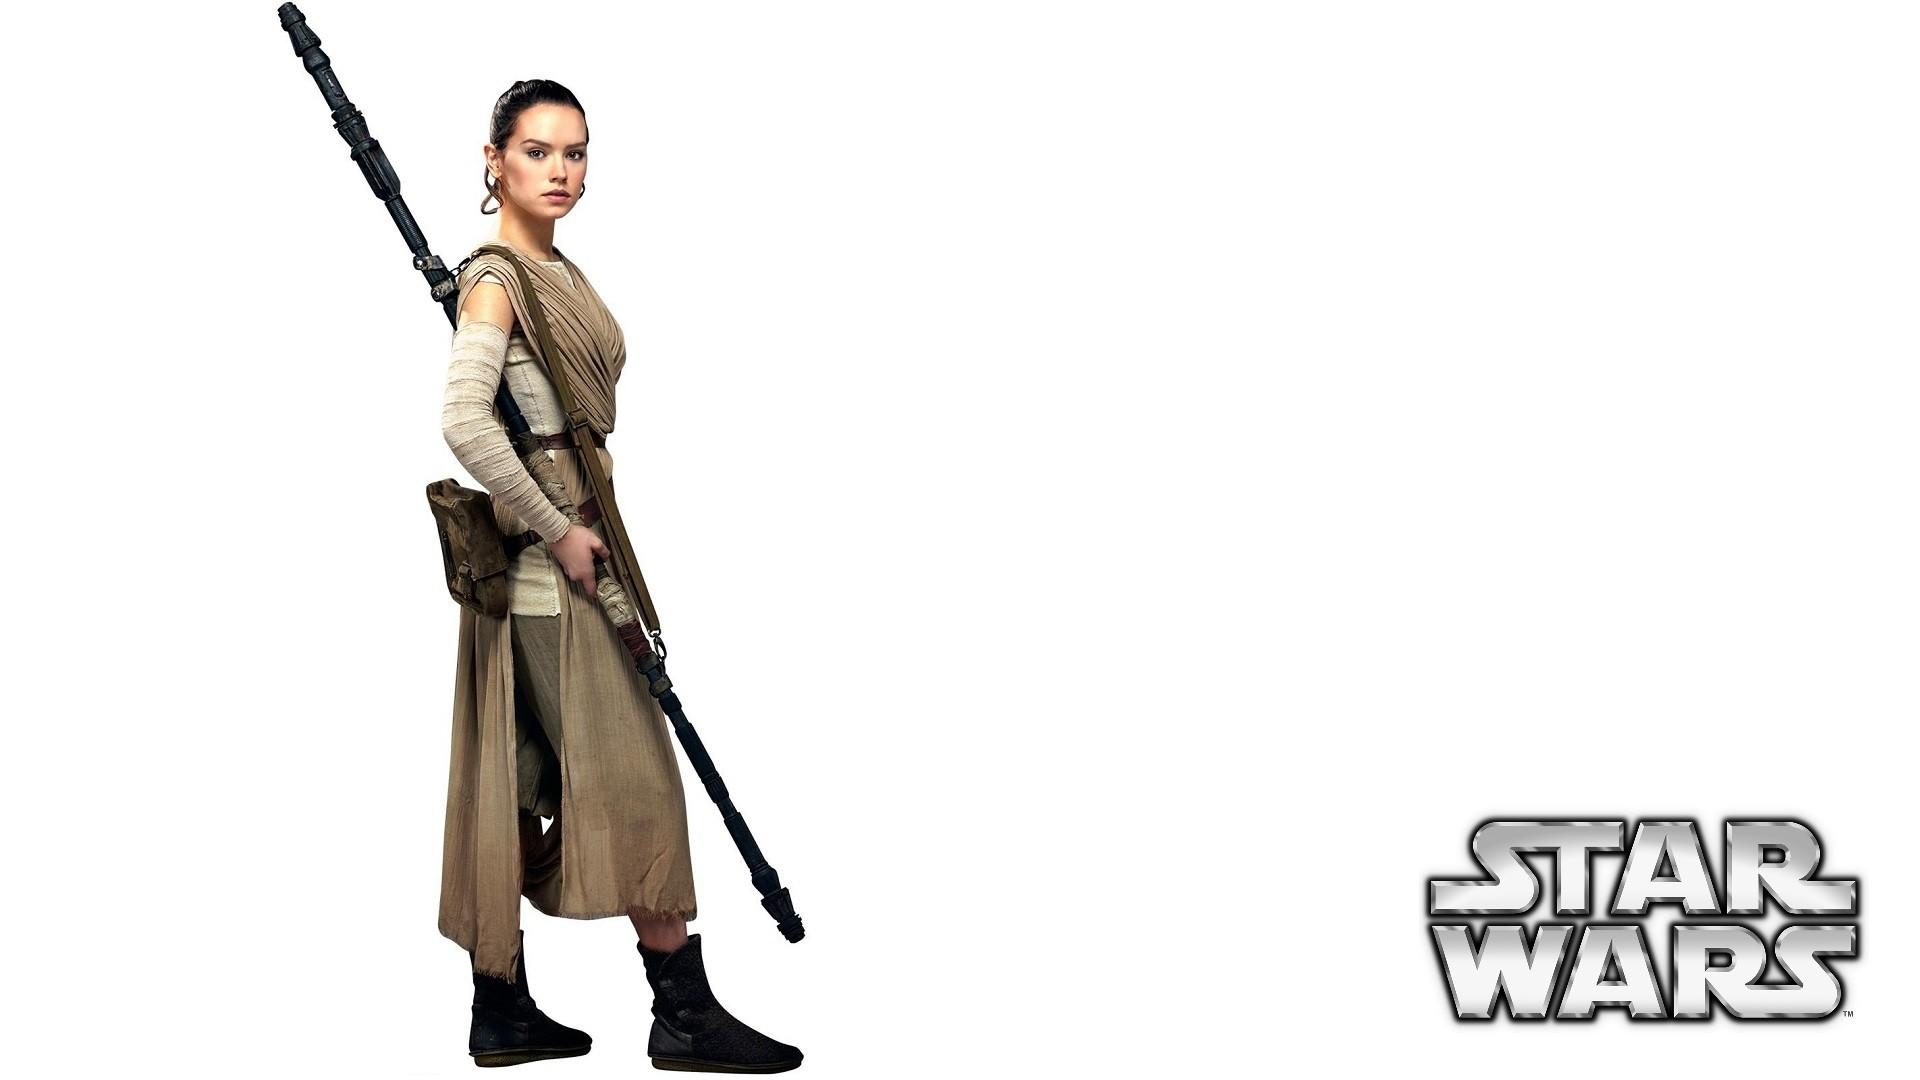 Star Wars – The Force Awakens: Daisy Ridley / Rey wallpaper white  (1080p)